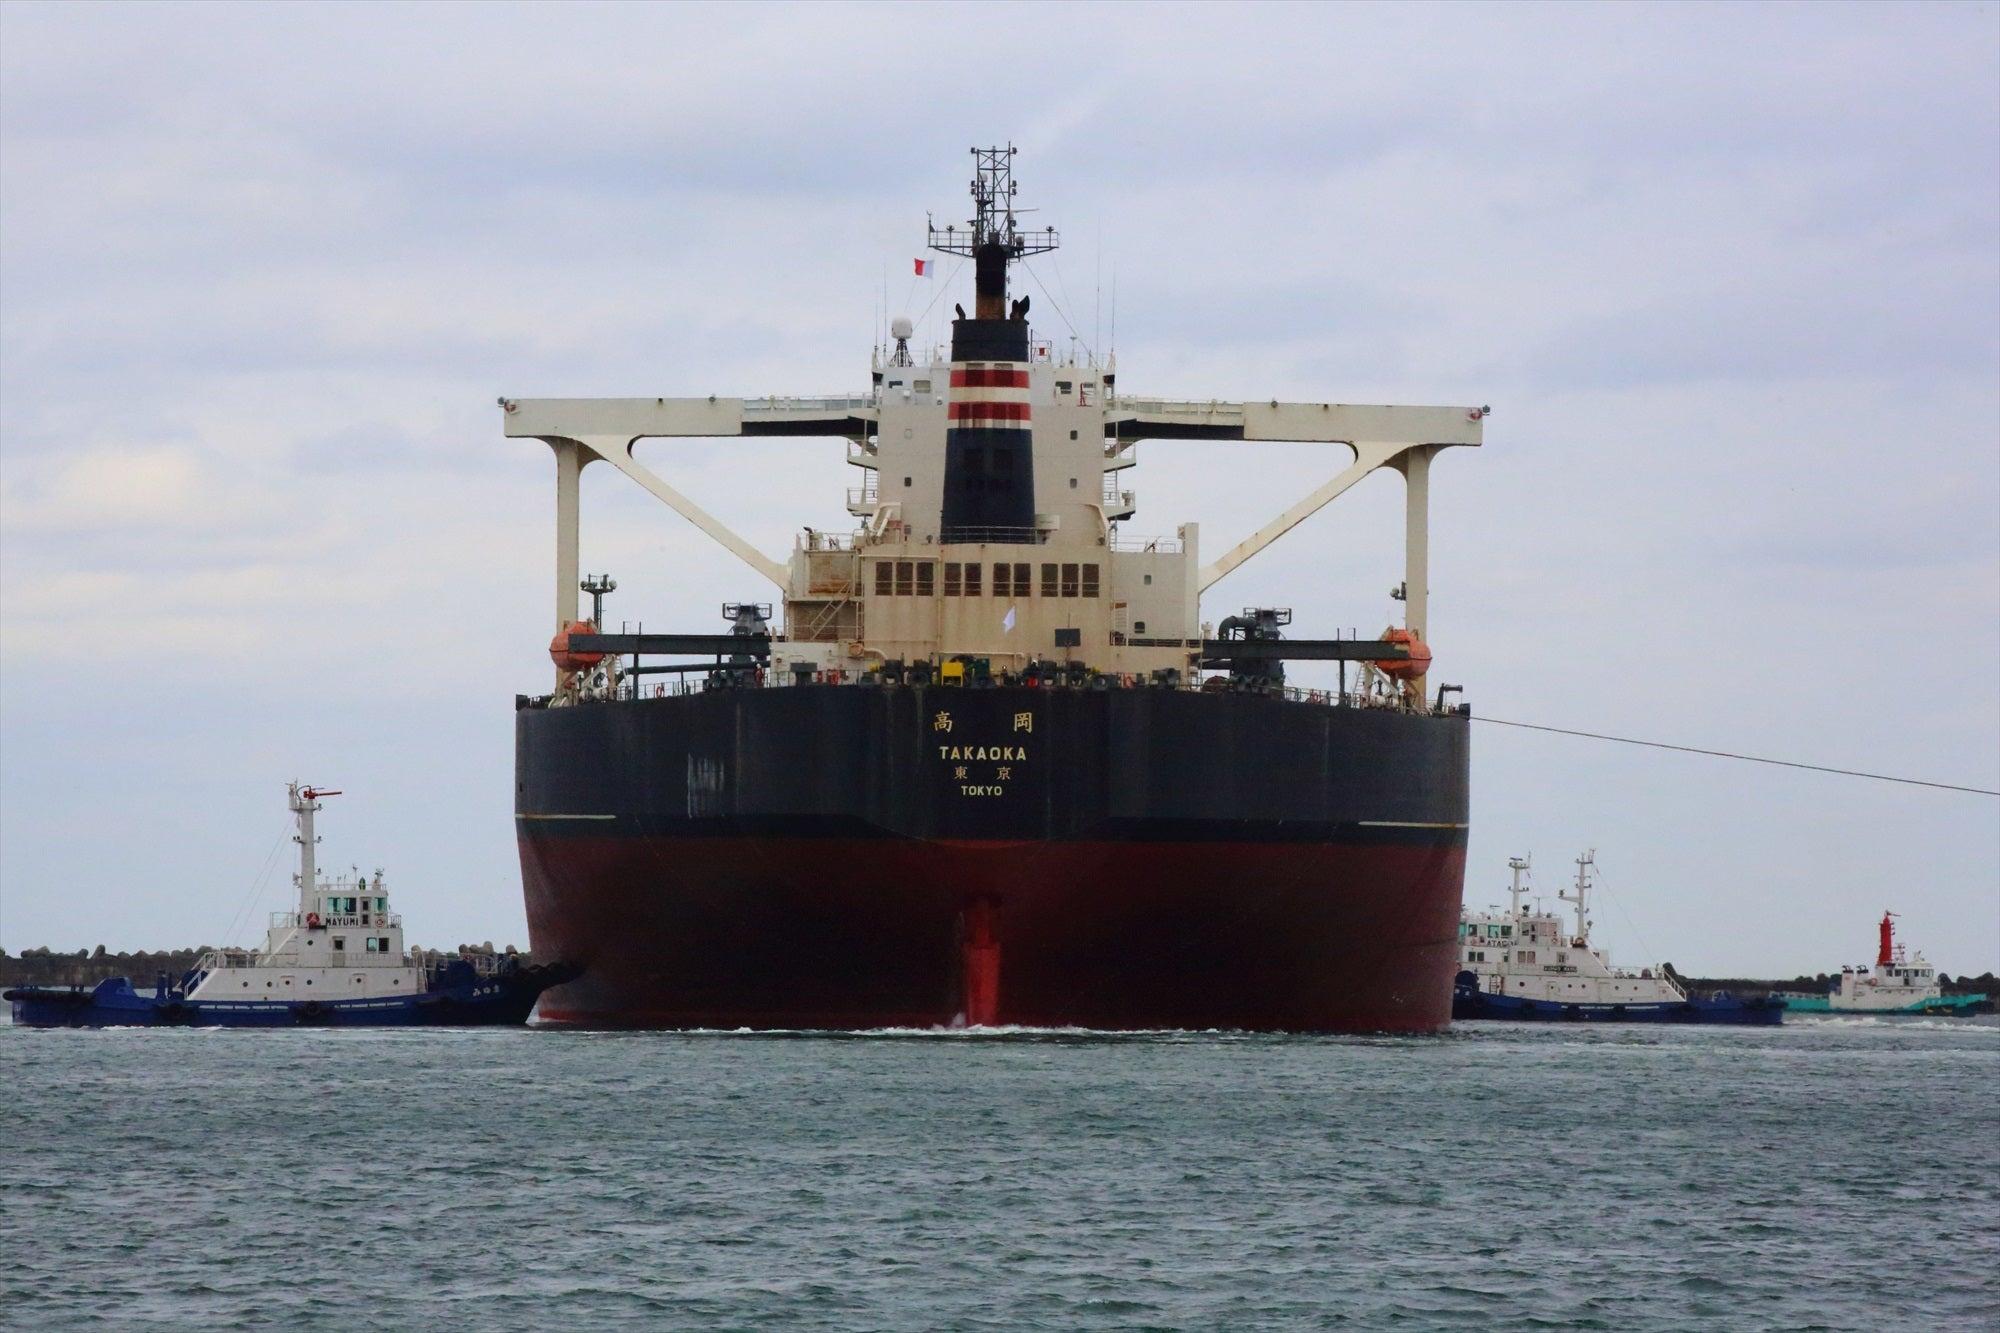 kazuhi49の船の写真館鹿島港の風景 NYKのVLCC「TAKAOKA」